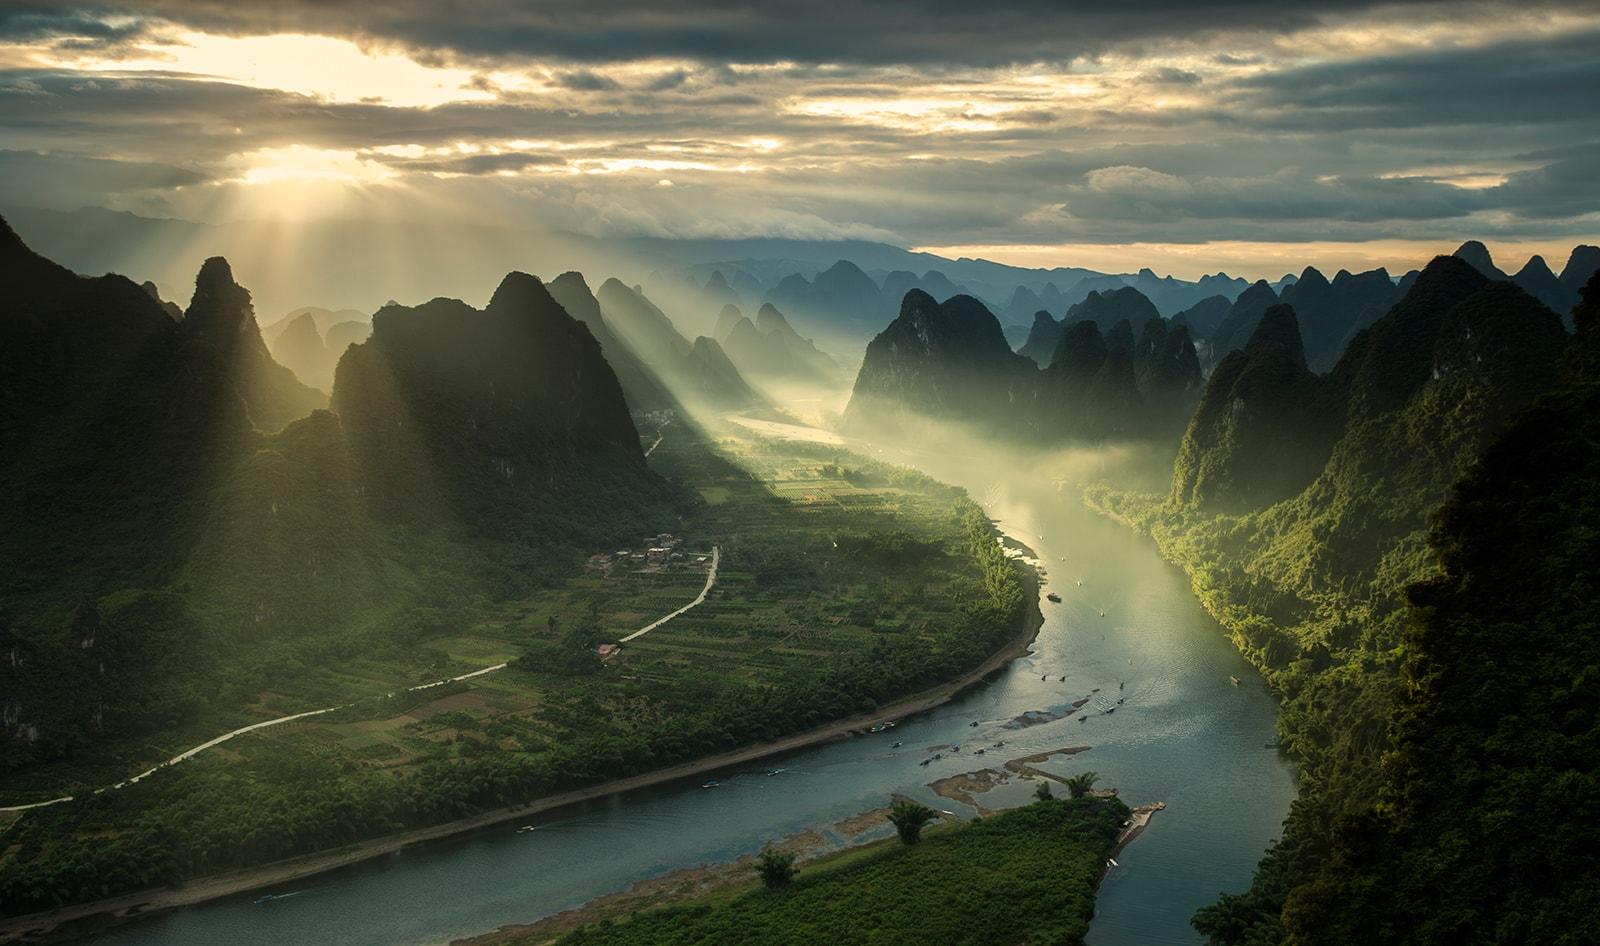 Viaggio_fotografico_Cina_Bracali